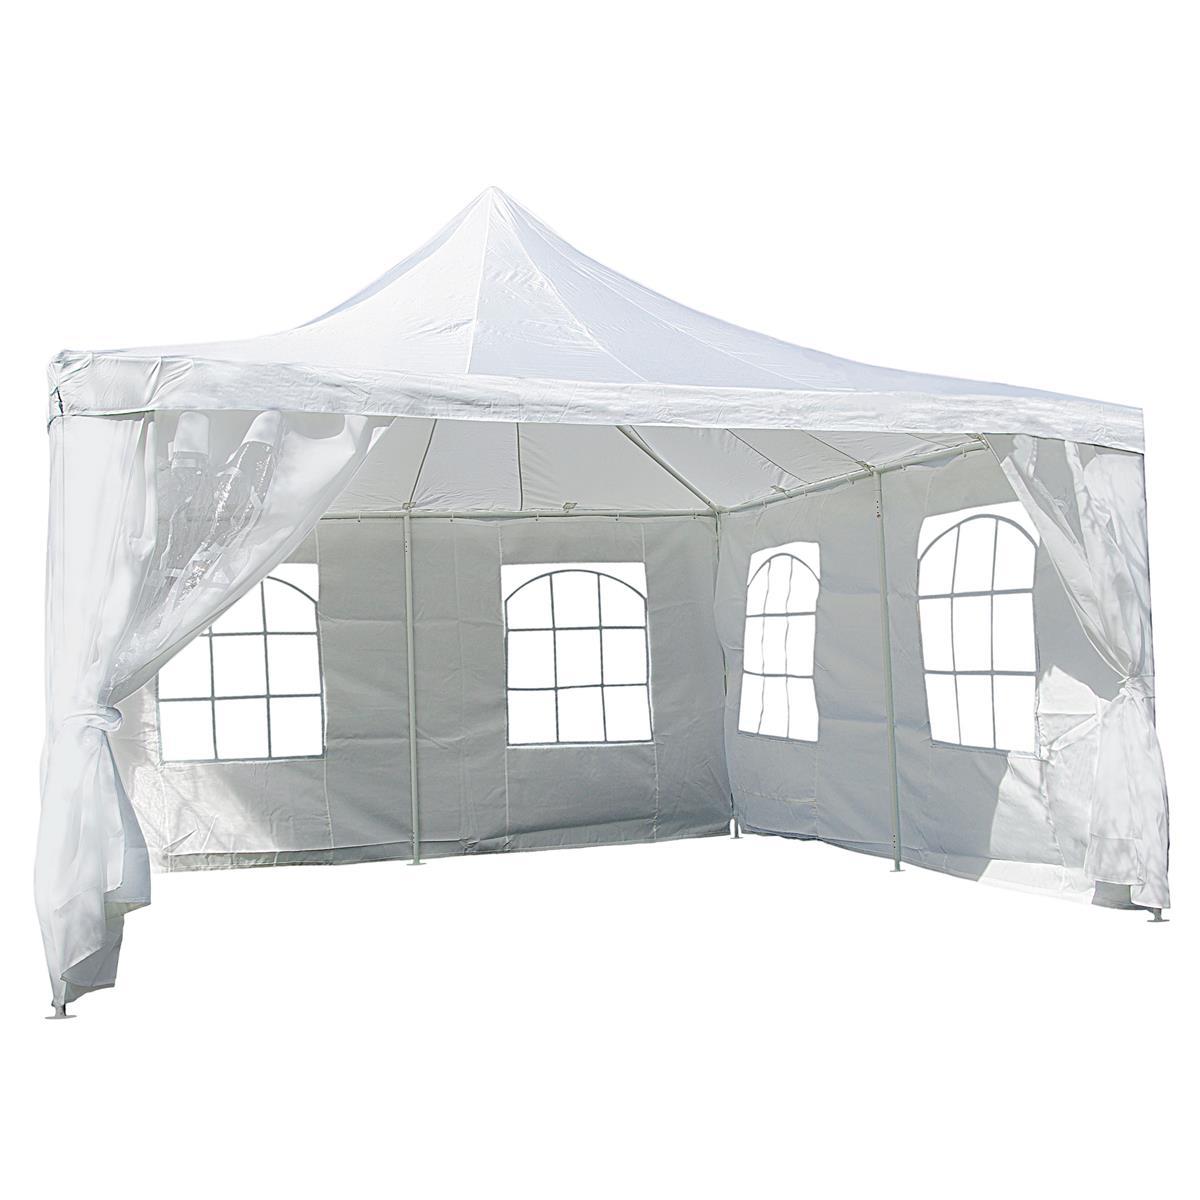 Partyzelt Pavillon Zelt Festzelt creme 4 x 4m Polyester Dach wasserdicht 250 g/m